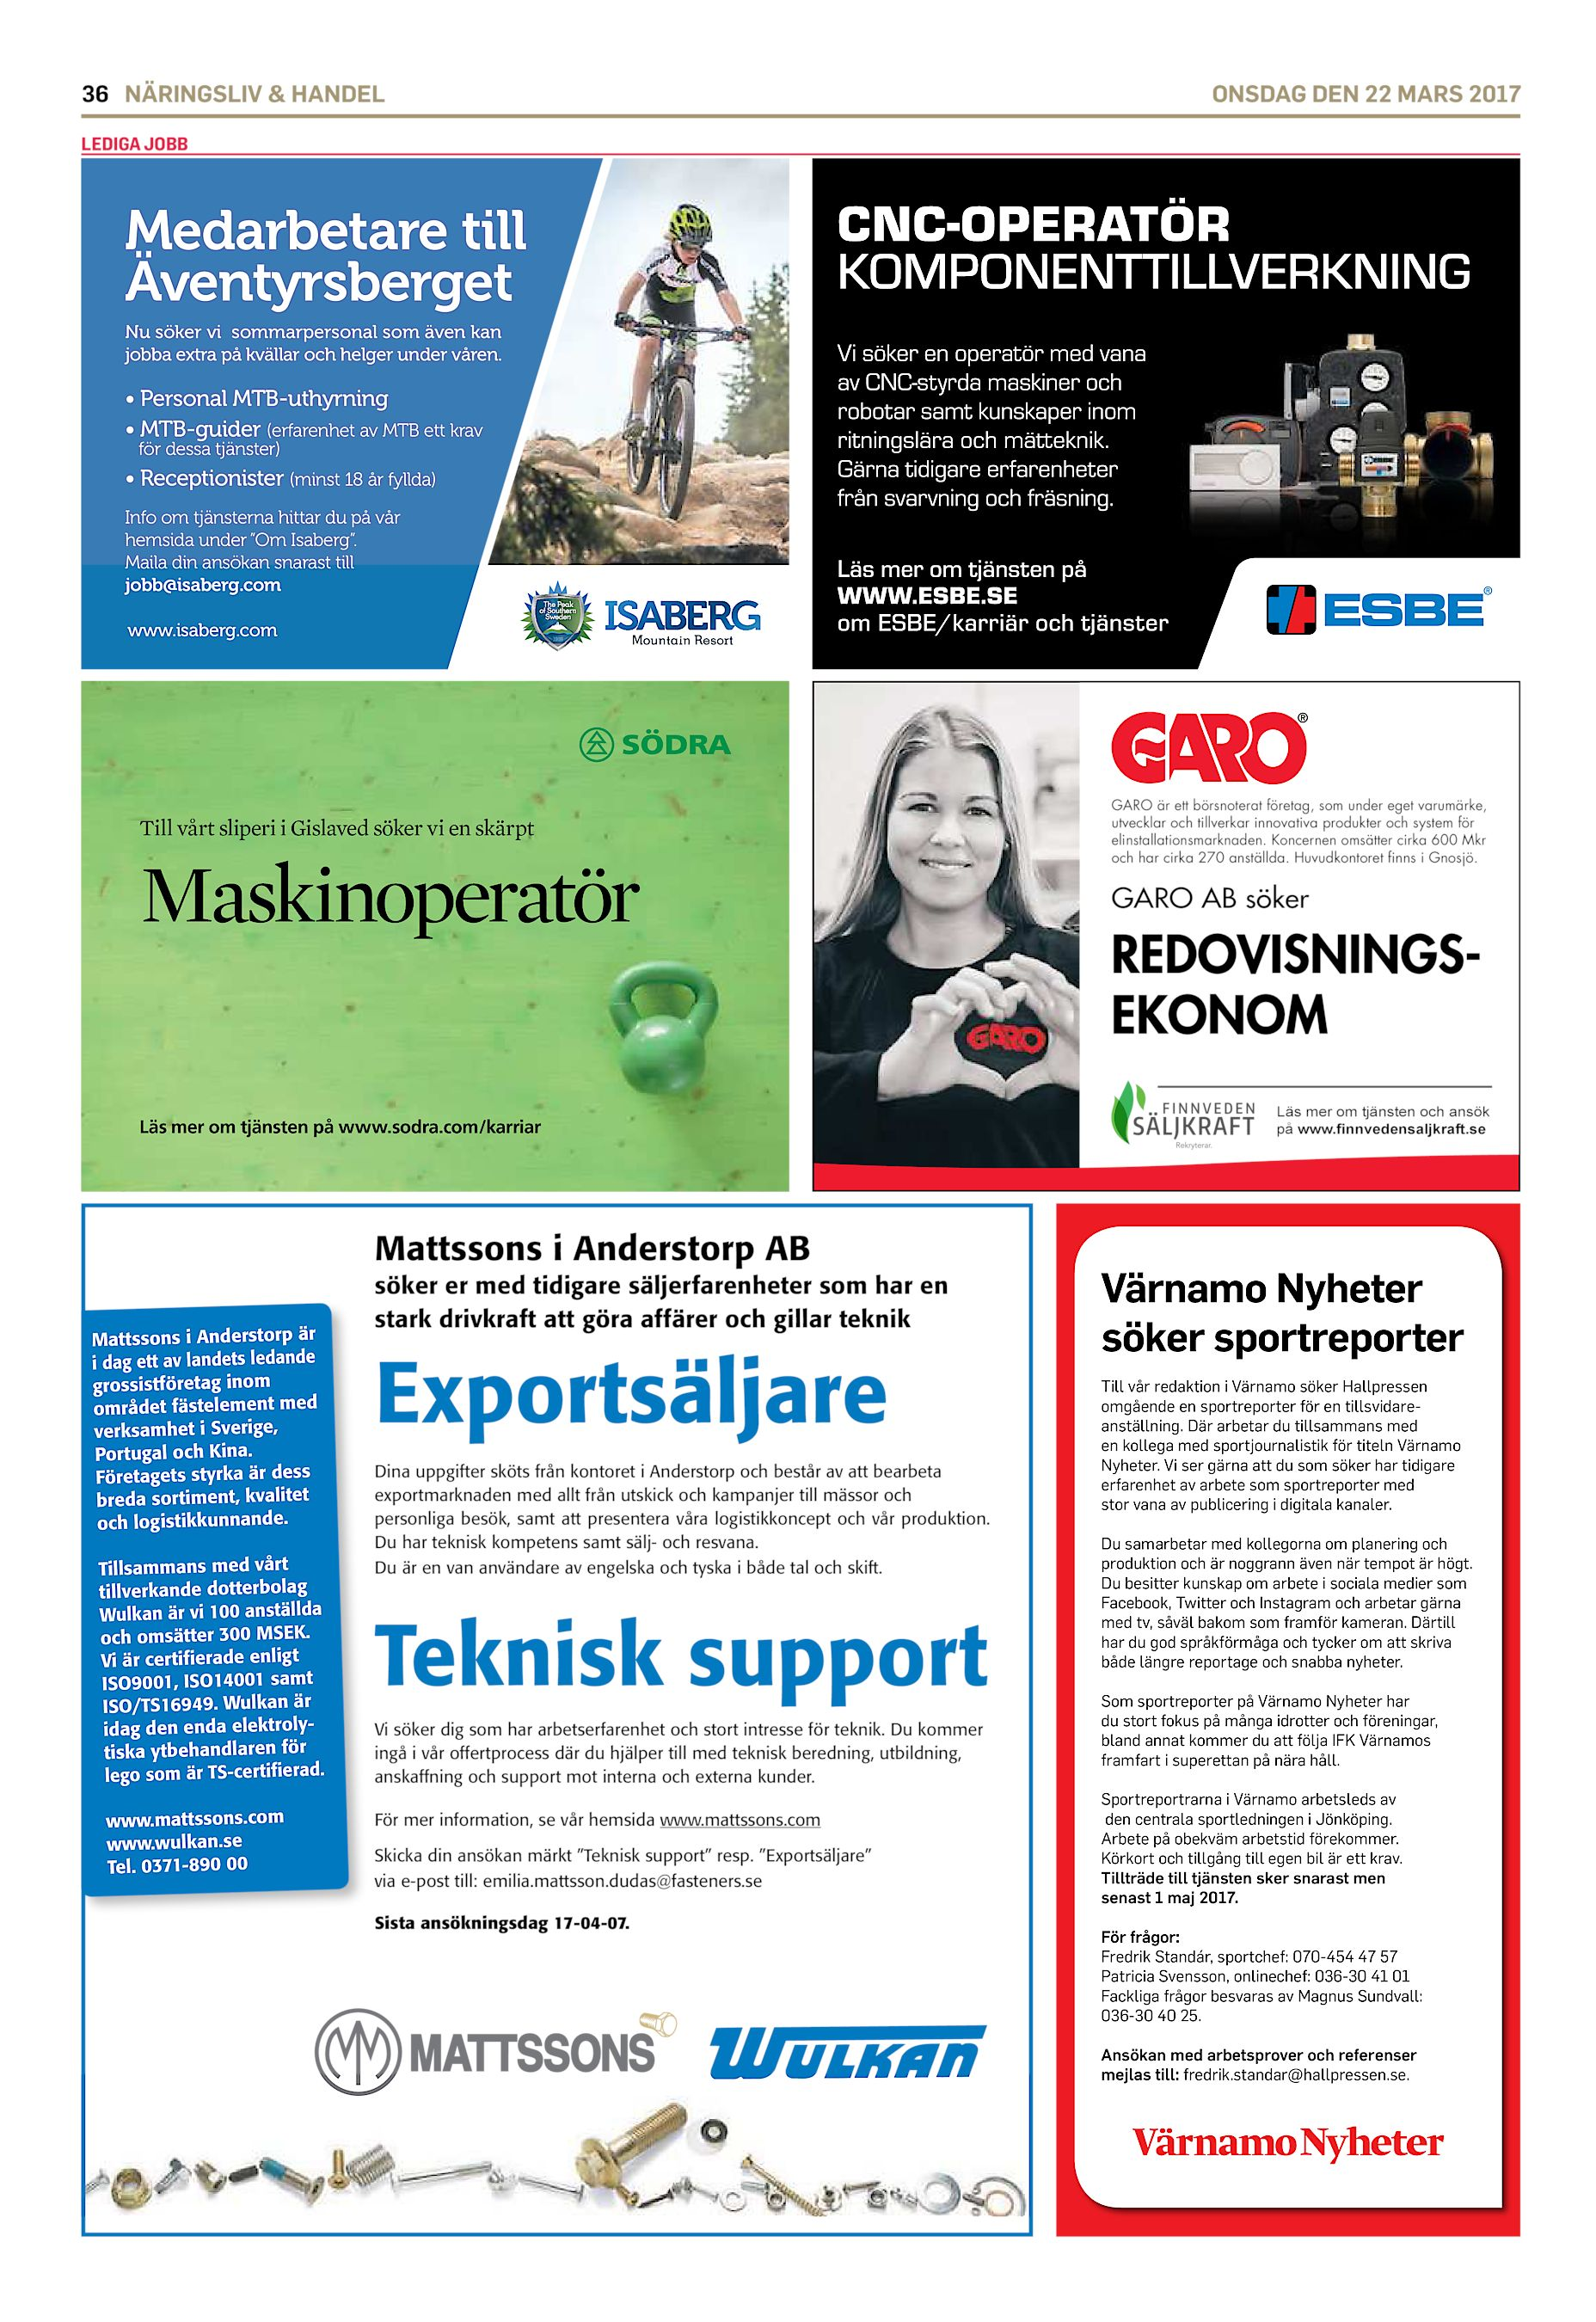 Cecilia Kppi, Krokusvgen 2, Anderstorp | satisfaction-survey.net